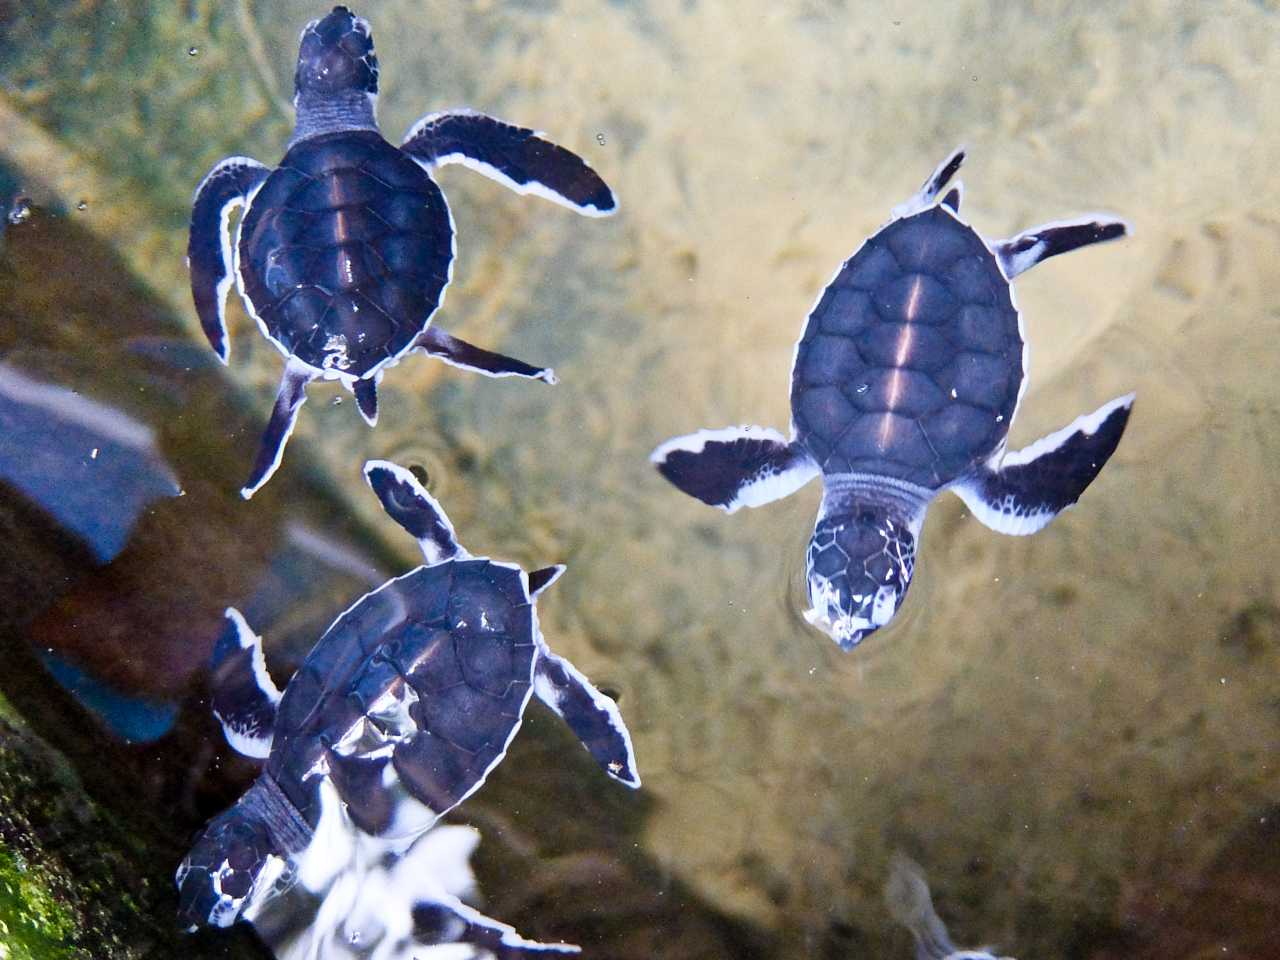 Sri Lanka road trip - Young Turtles